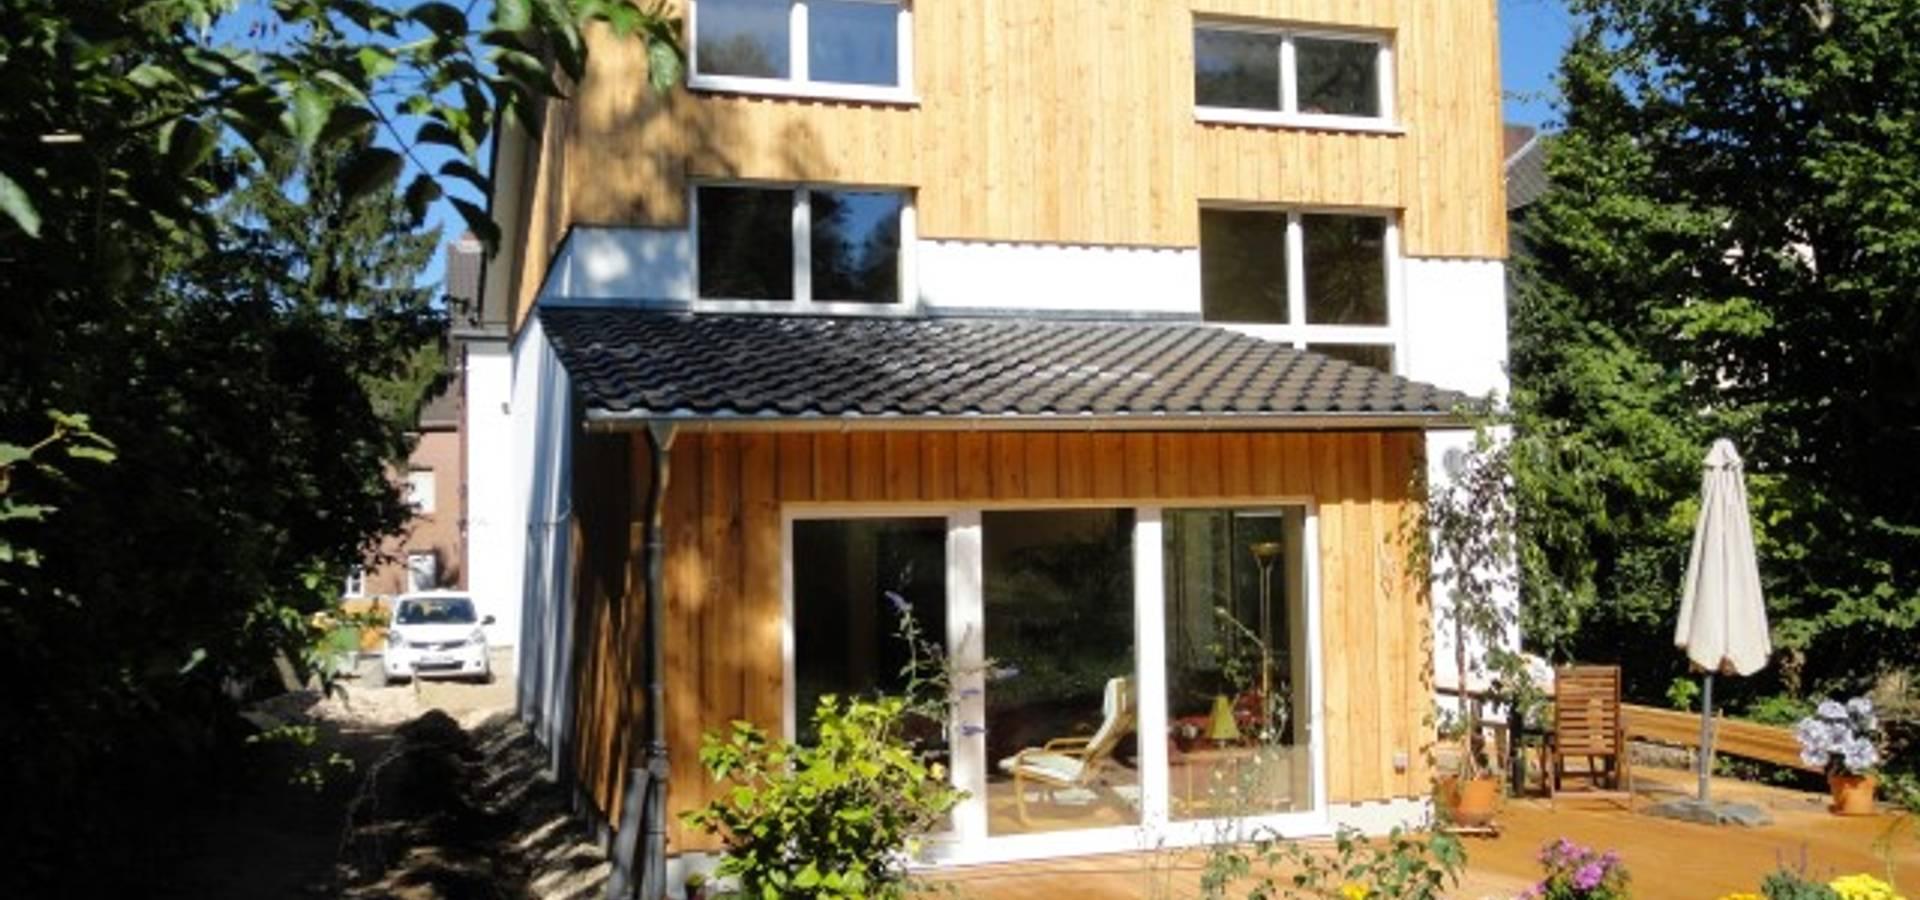 Planquadrat-Architekten PartG mbB